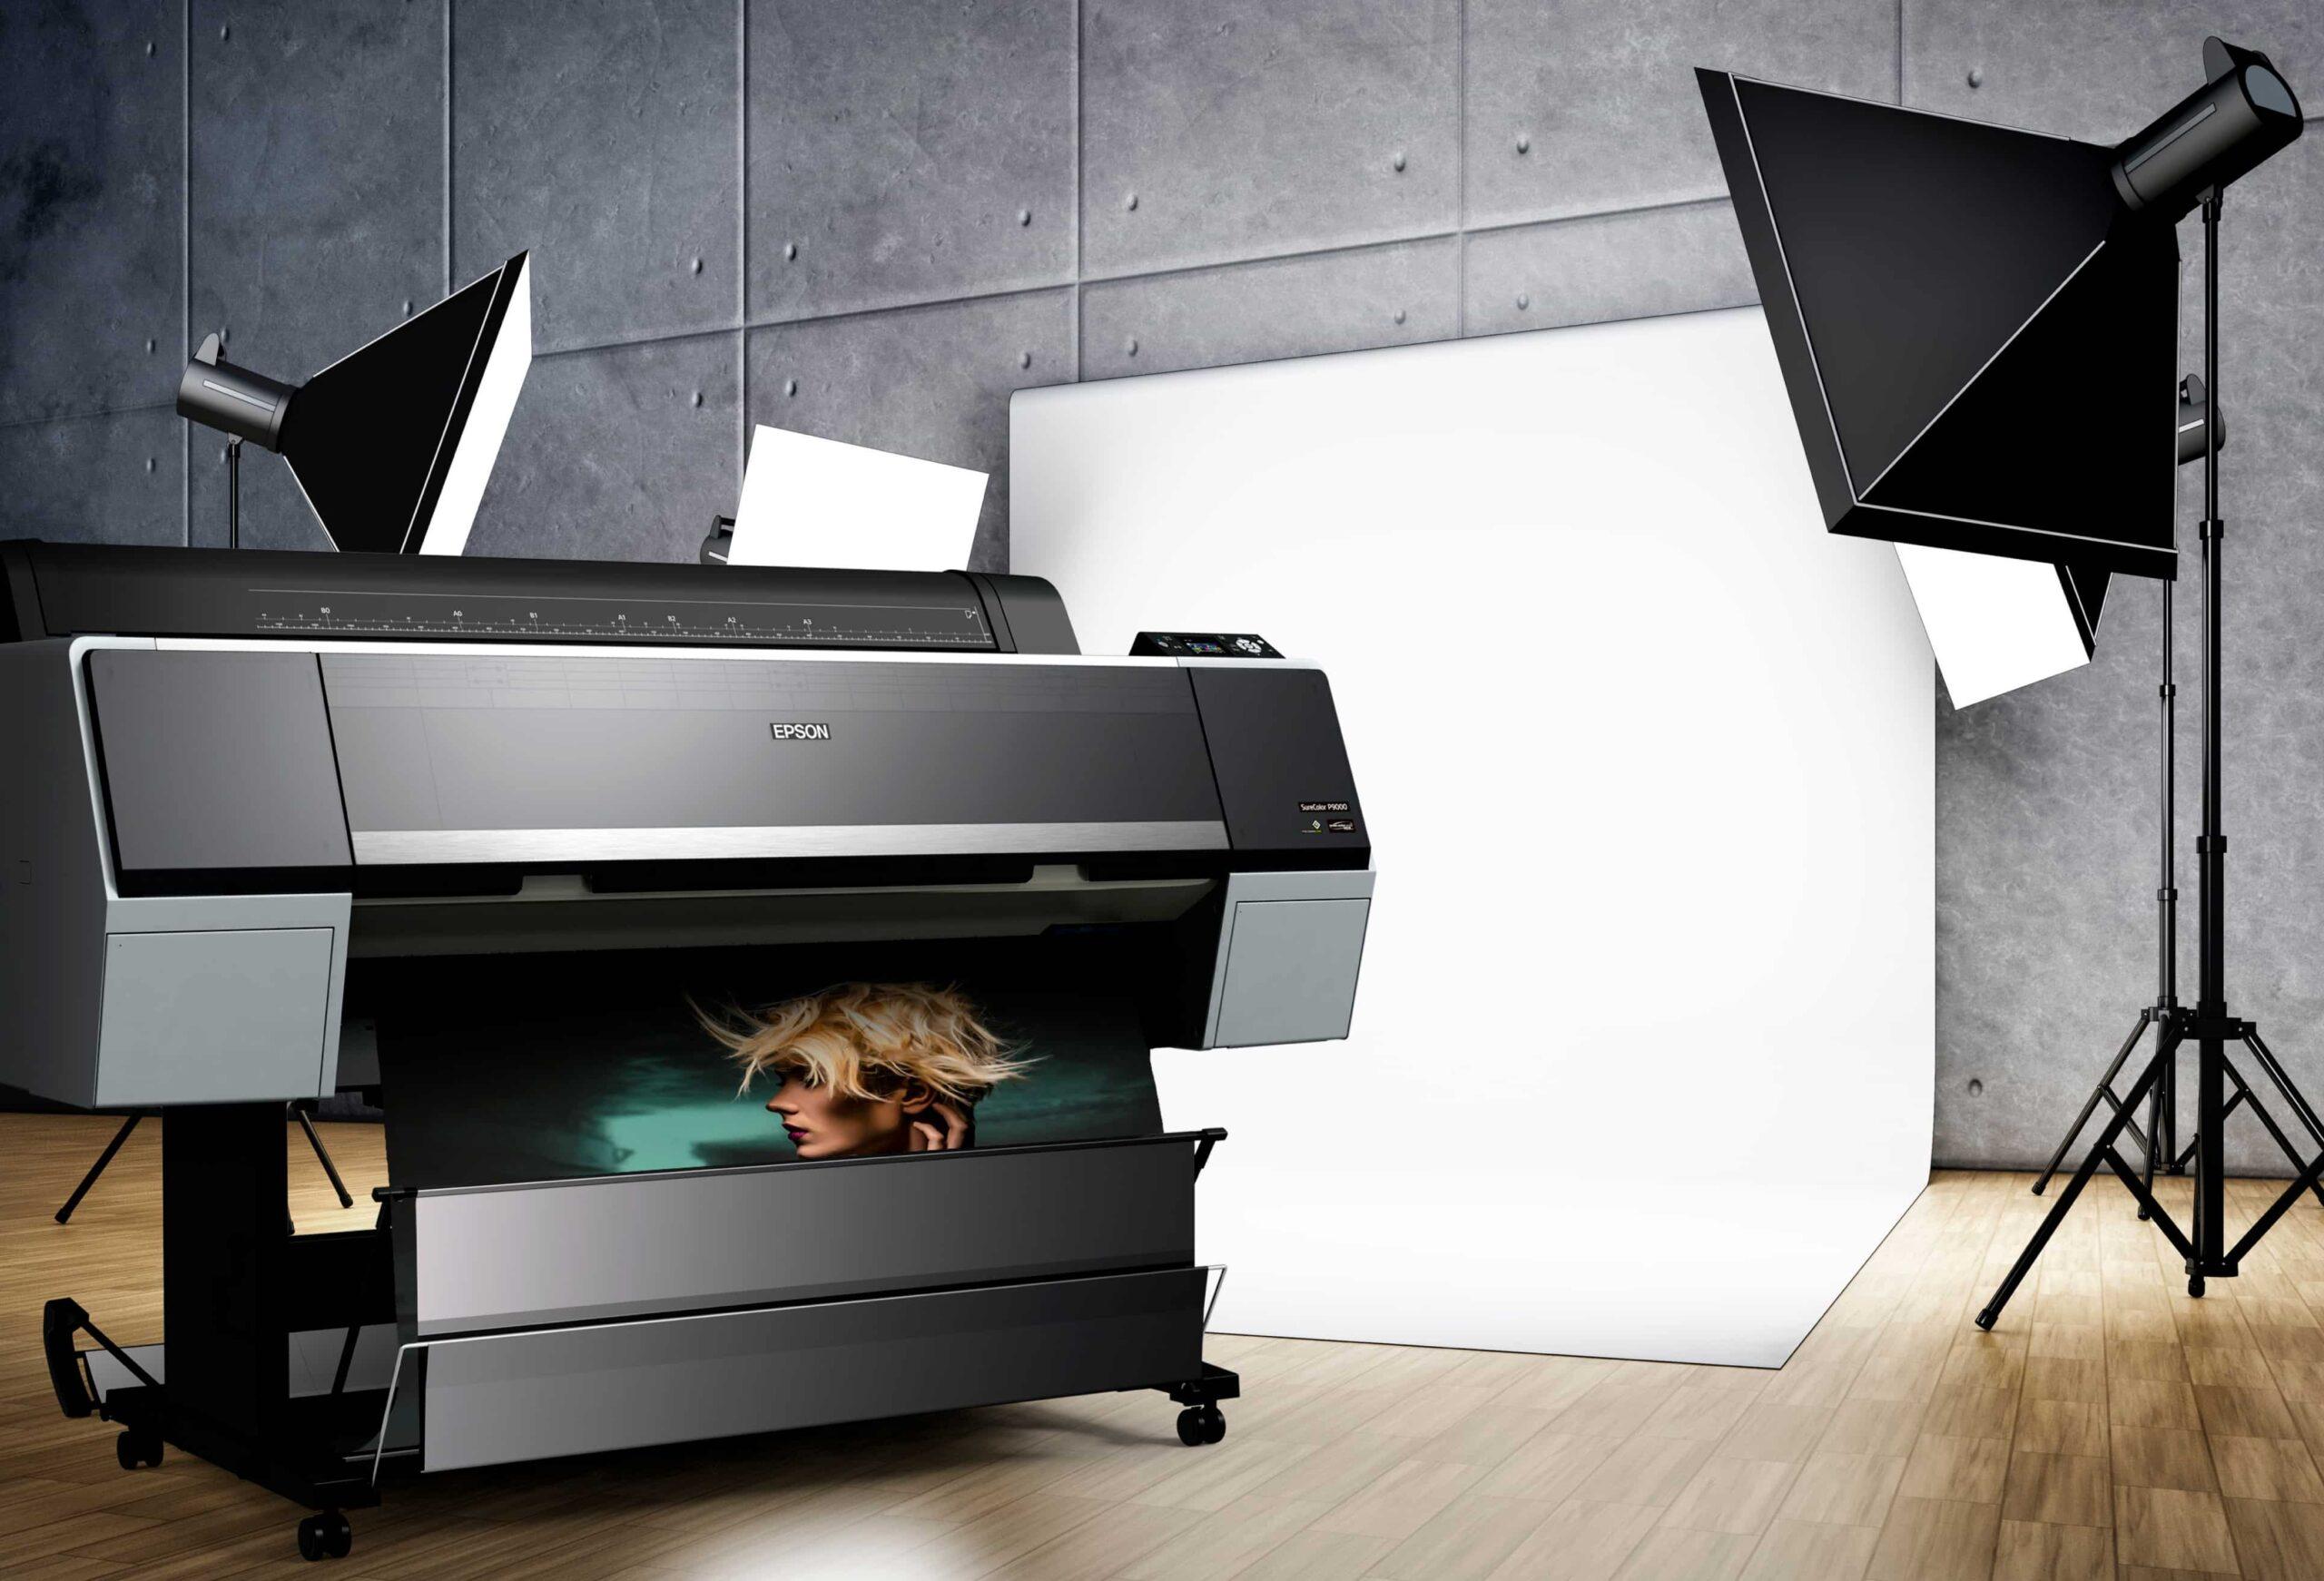 Epson Inkjet Large format Printer - Tenaui Middle East